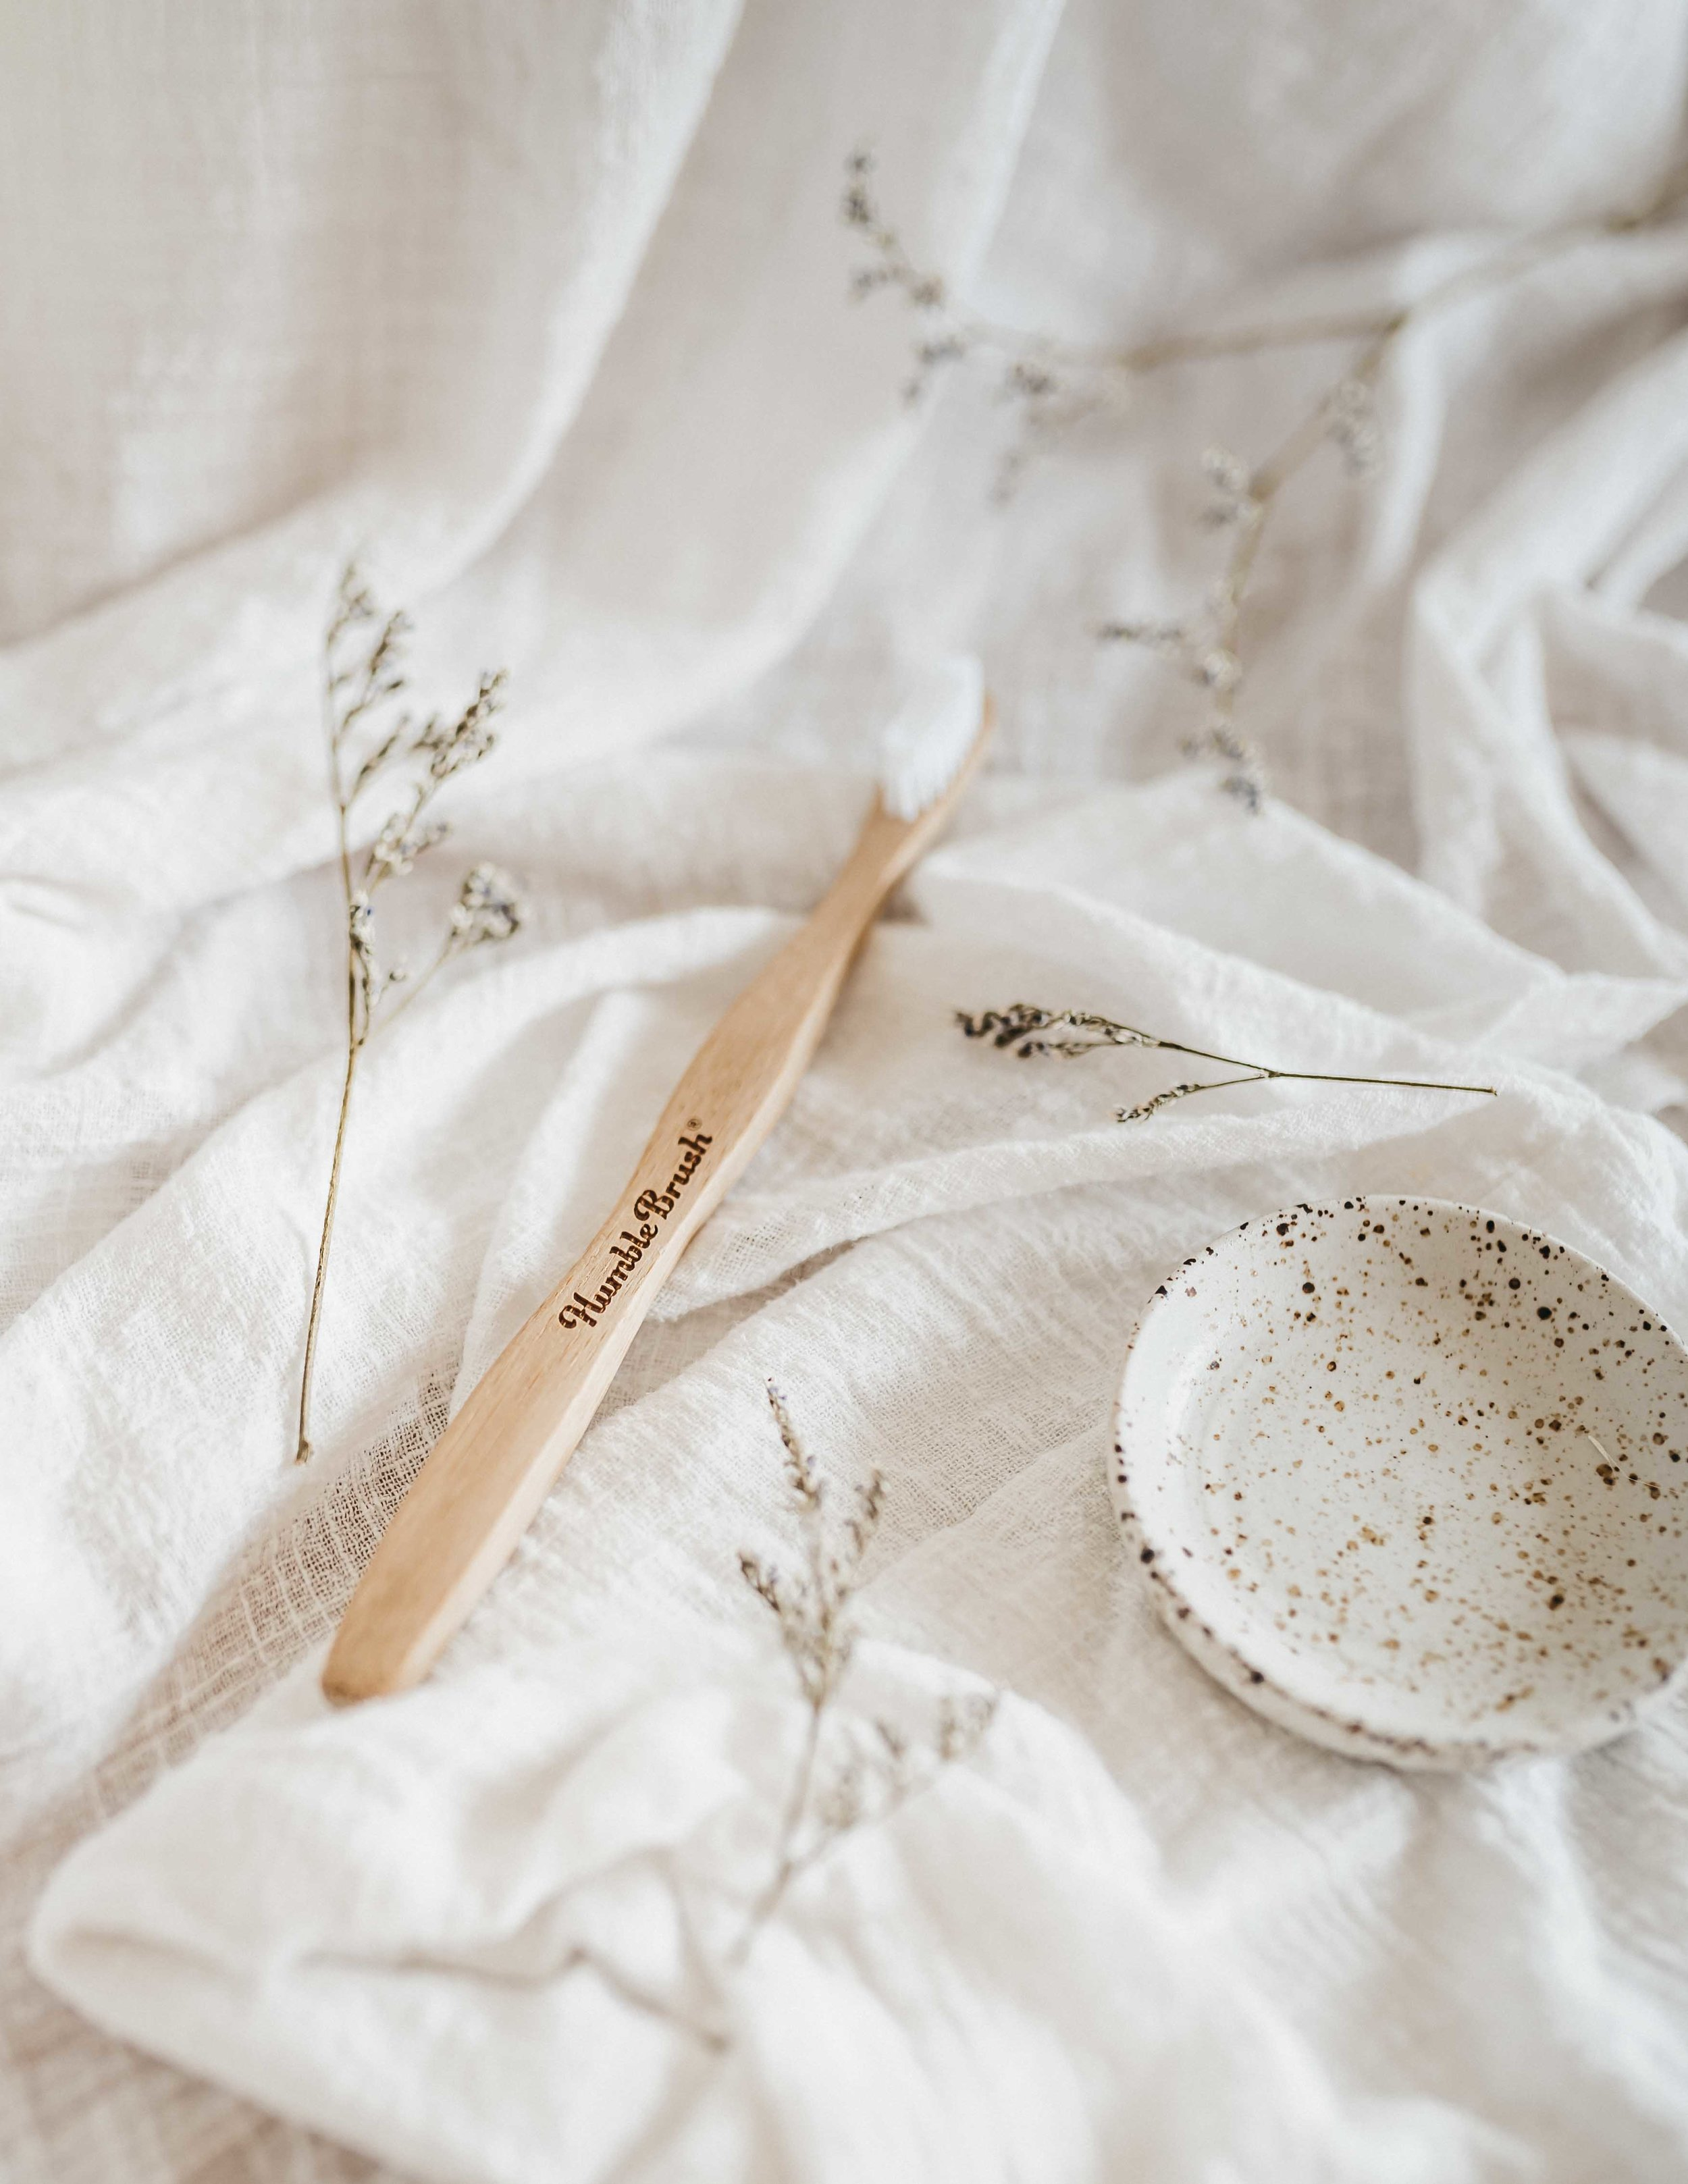 keira-mason-nowhere-and-everywhere-toothbrush-bamboo.jpg